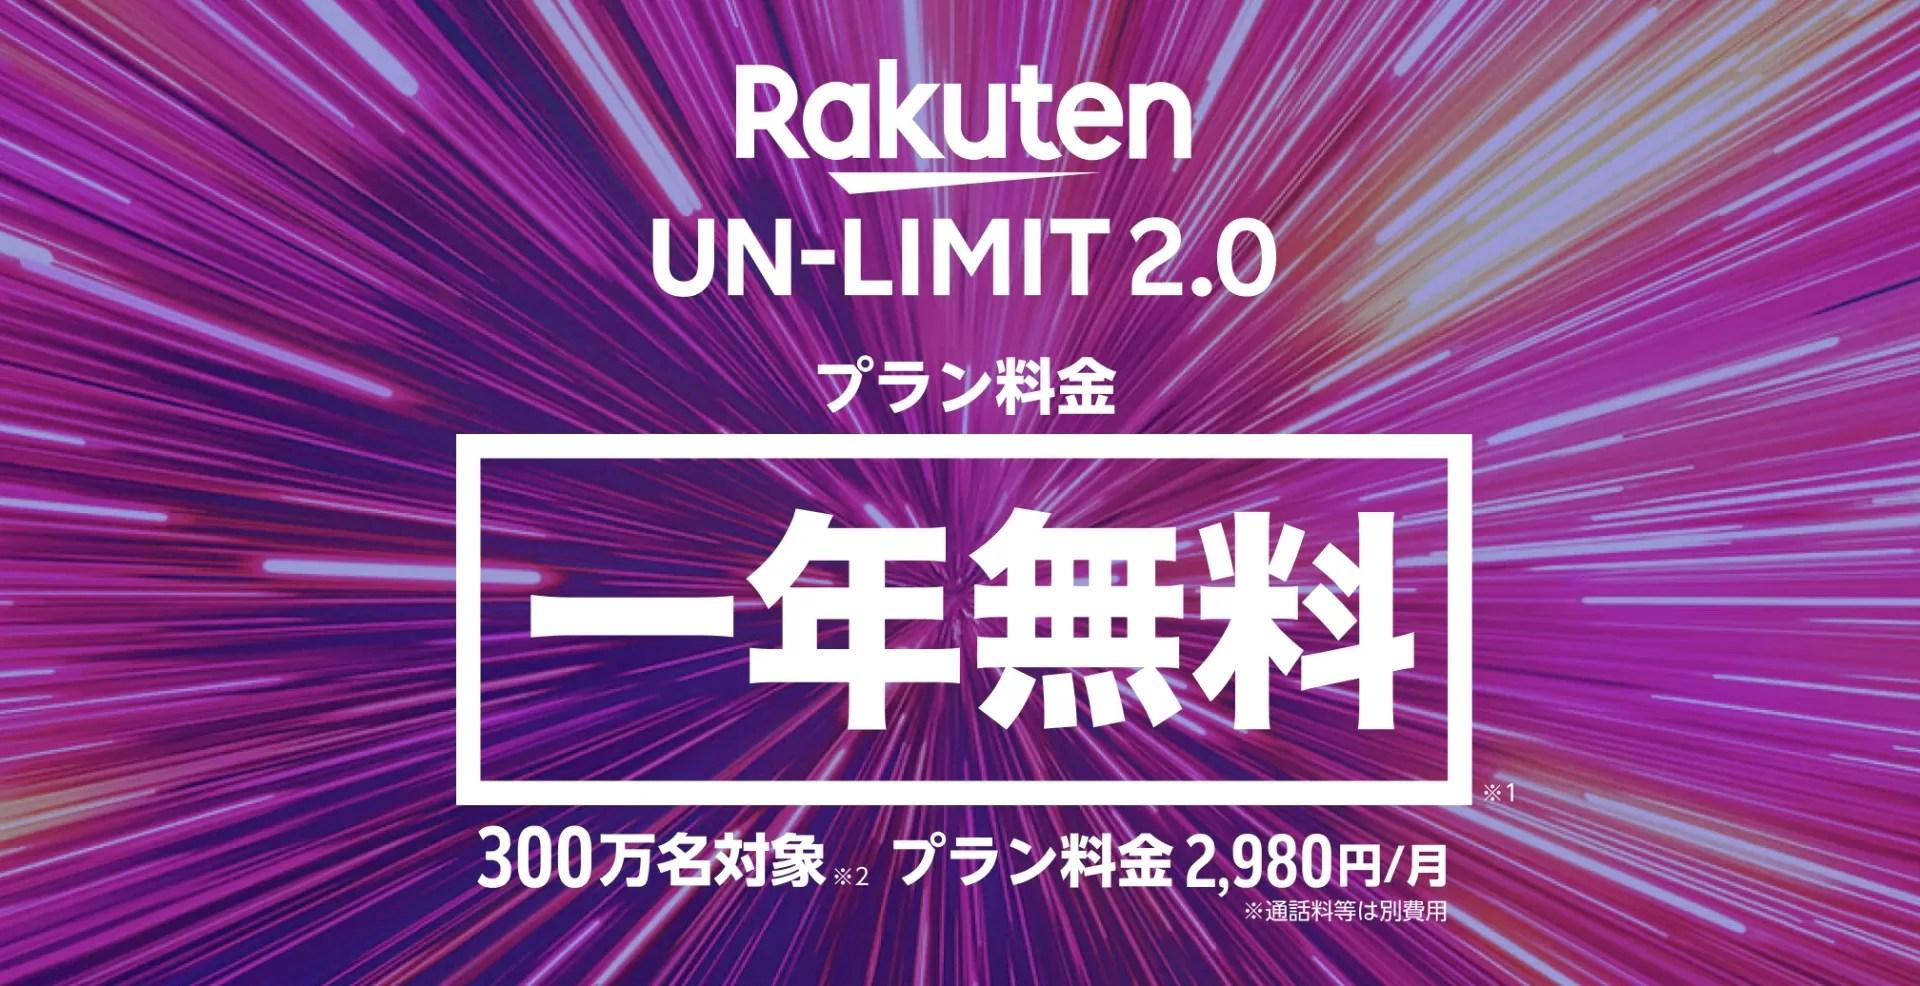 「Rakuten UN-LIMIT」が2.0にバージョンアップ!?これはマジおすすめかも知んない!